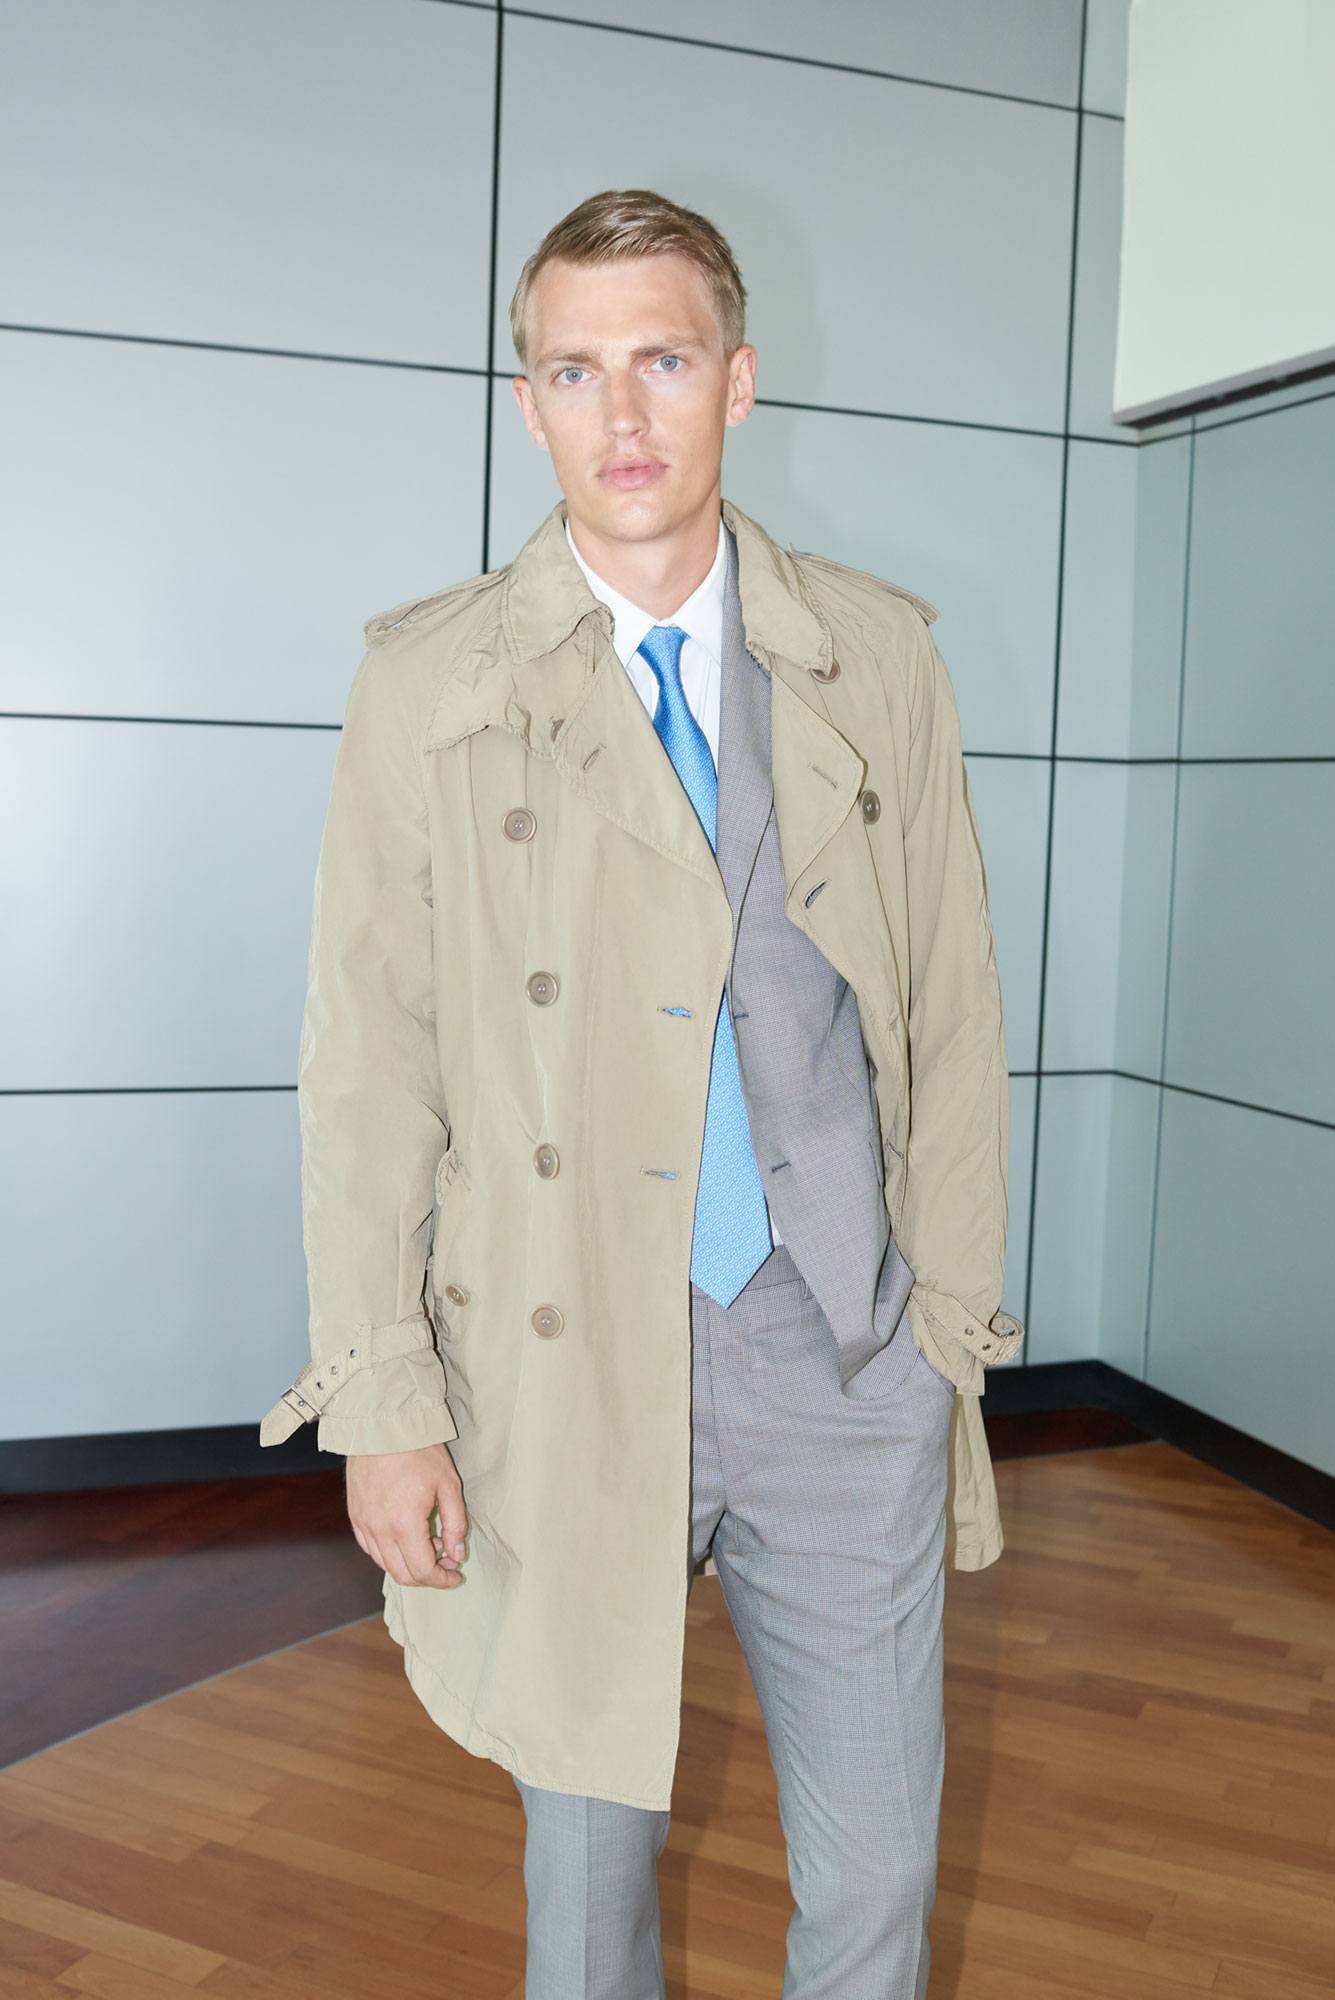 Yoox Officewear | Marco Pietracupa | Yoox | Numerique Retouch Photo Retouching Studio